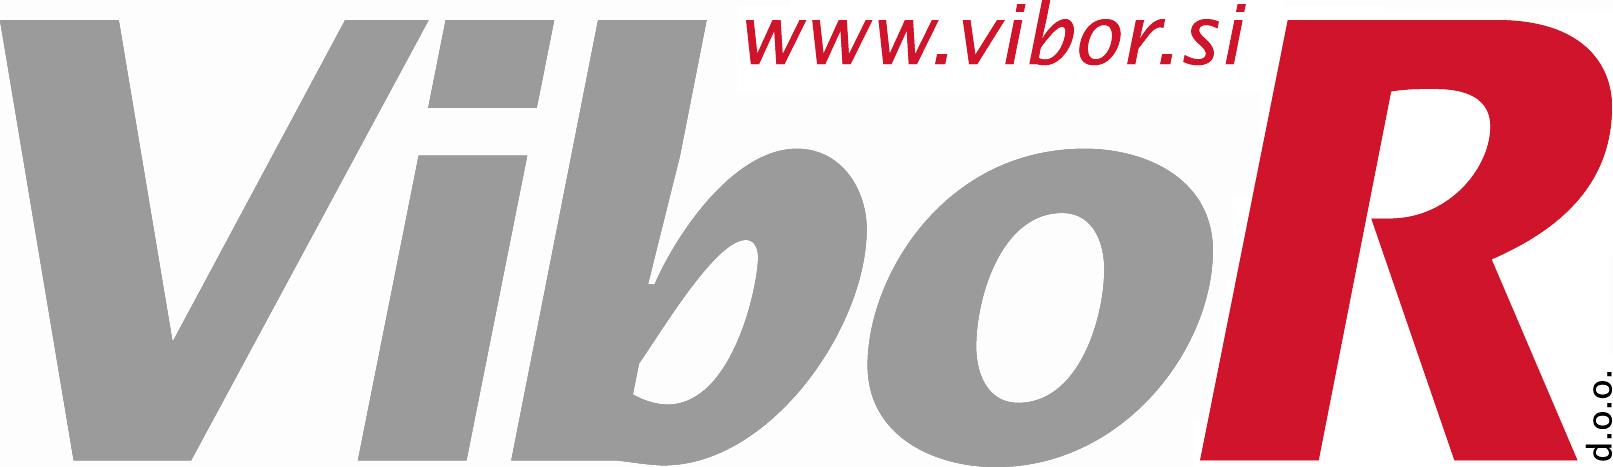 1_ViborlogoRGB.jpg